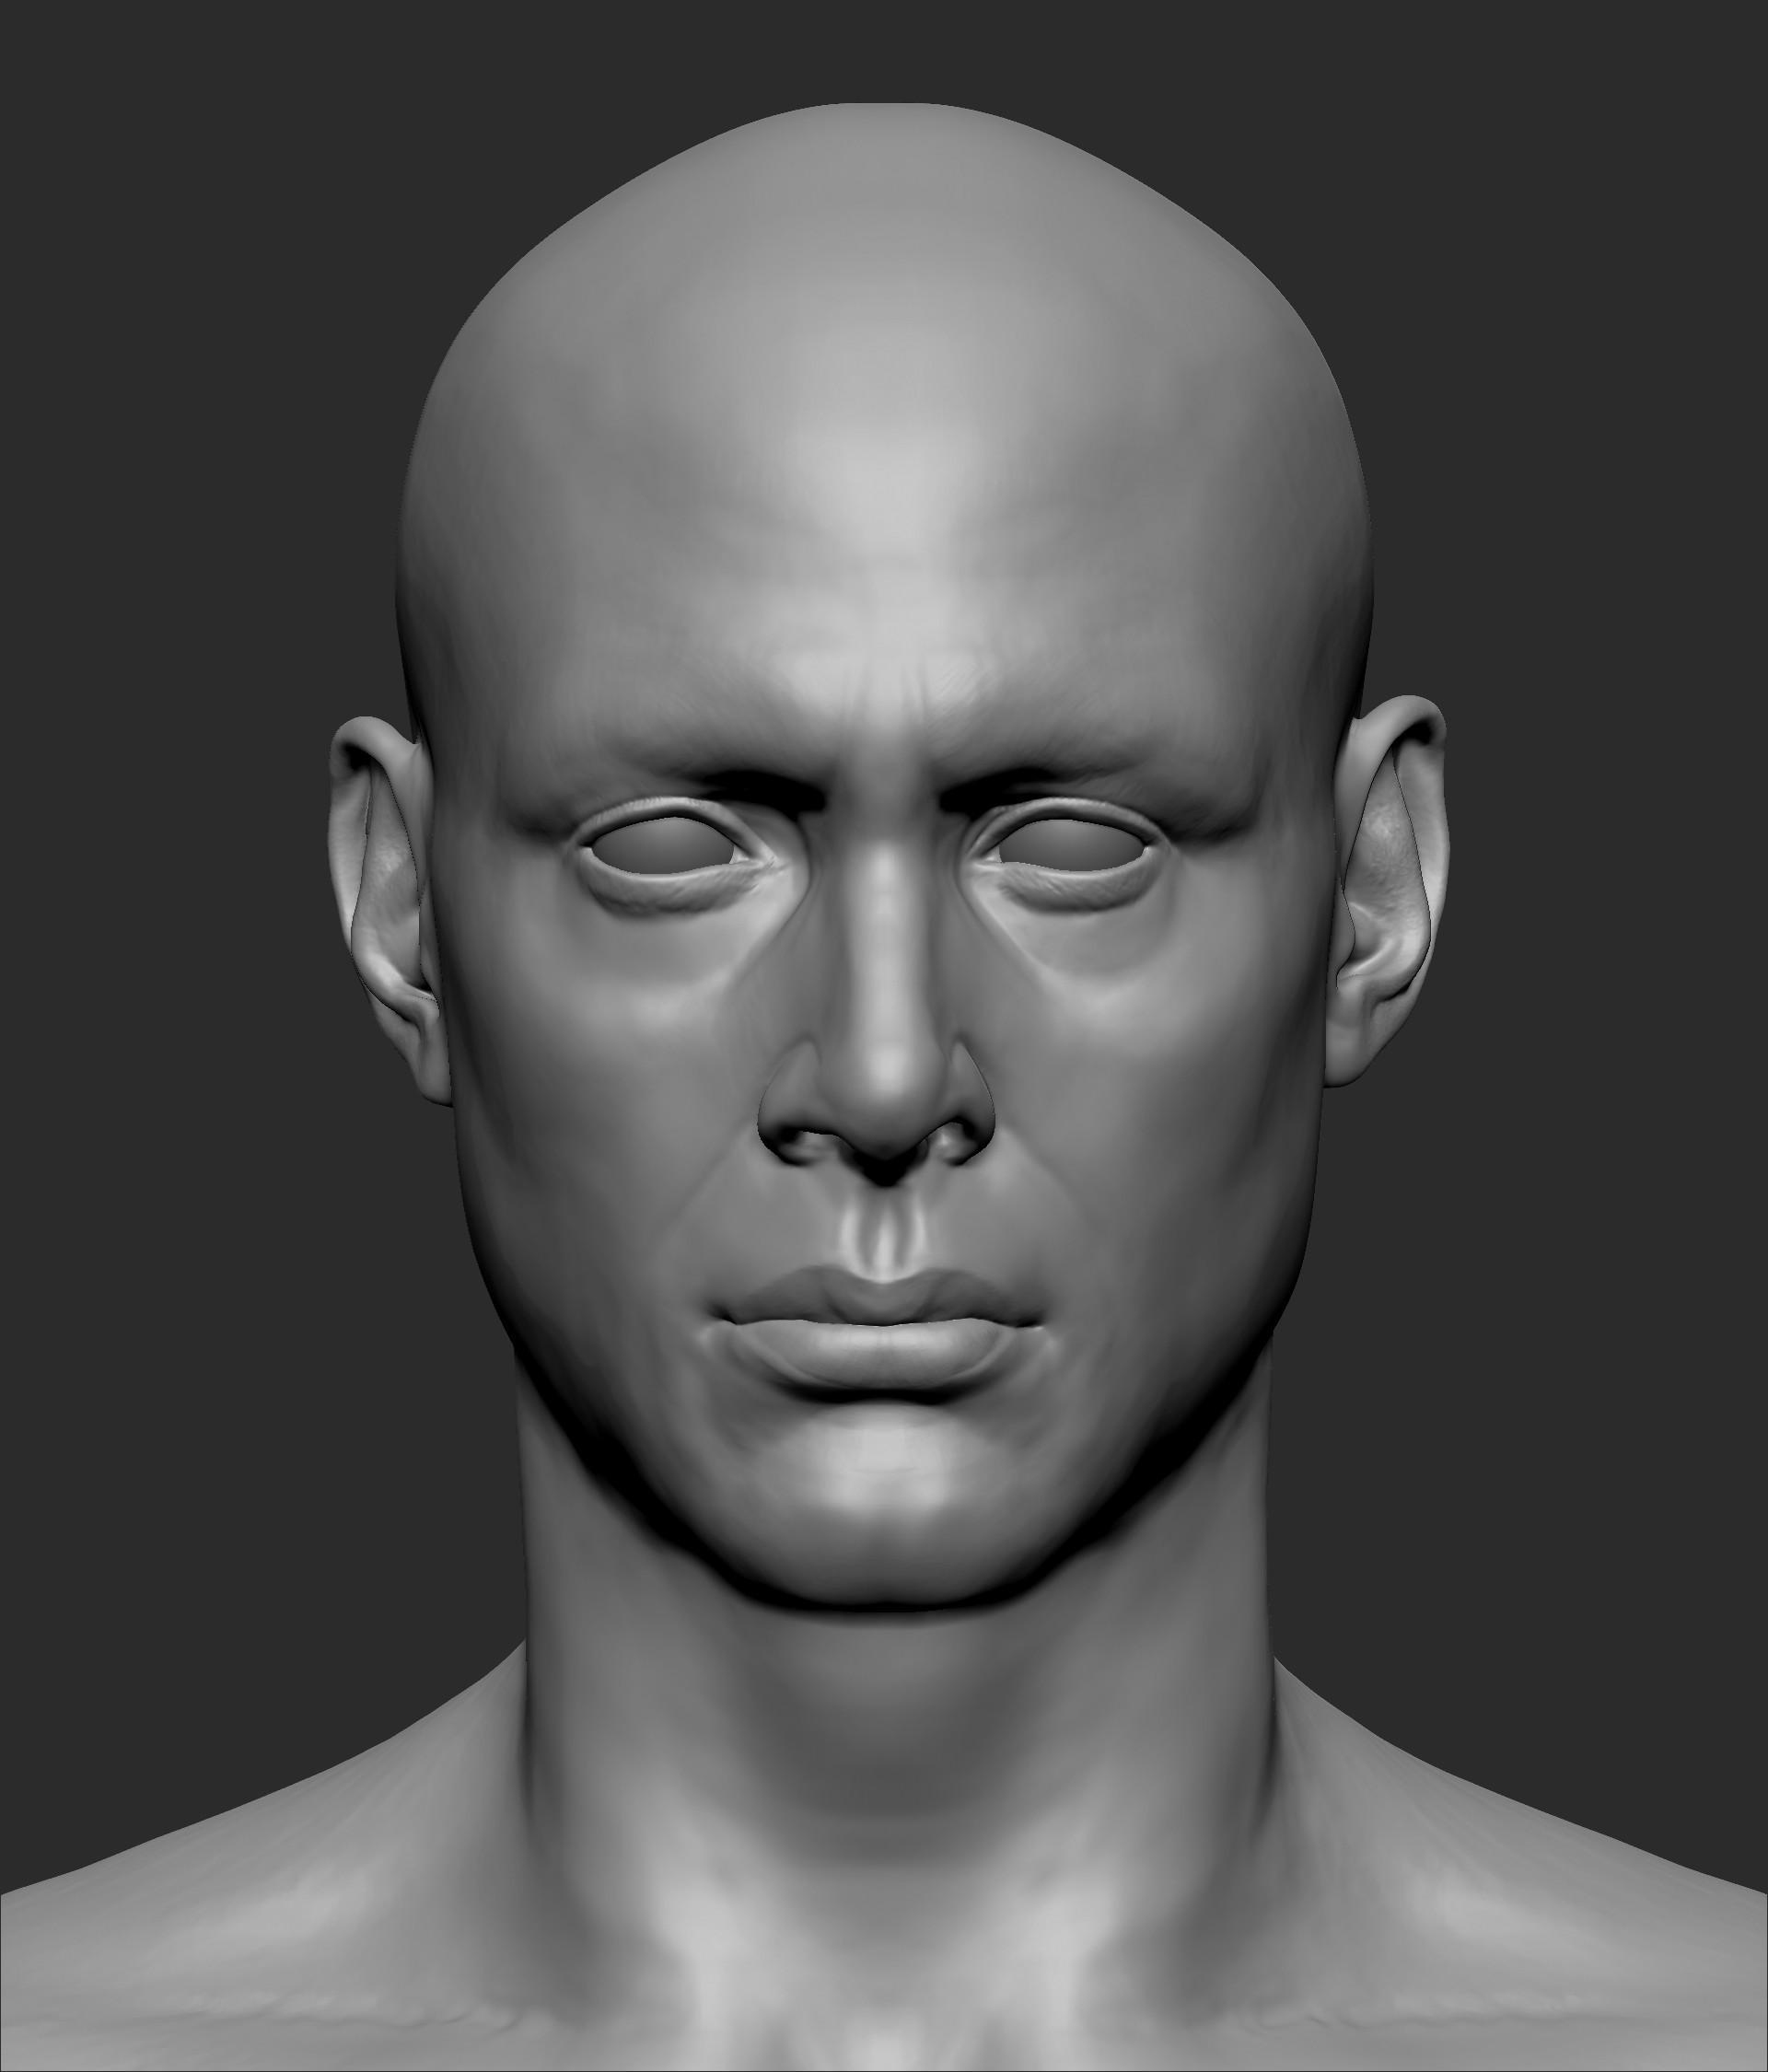 face anatomy - Kubre.euforic.co